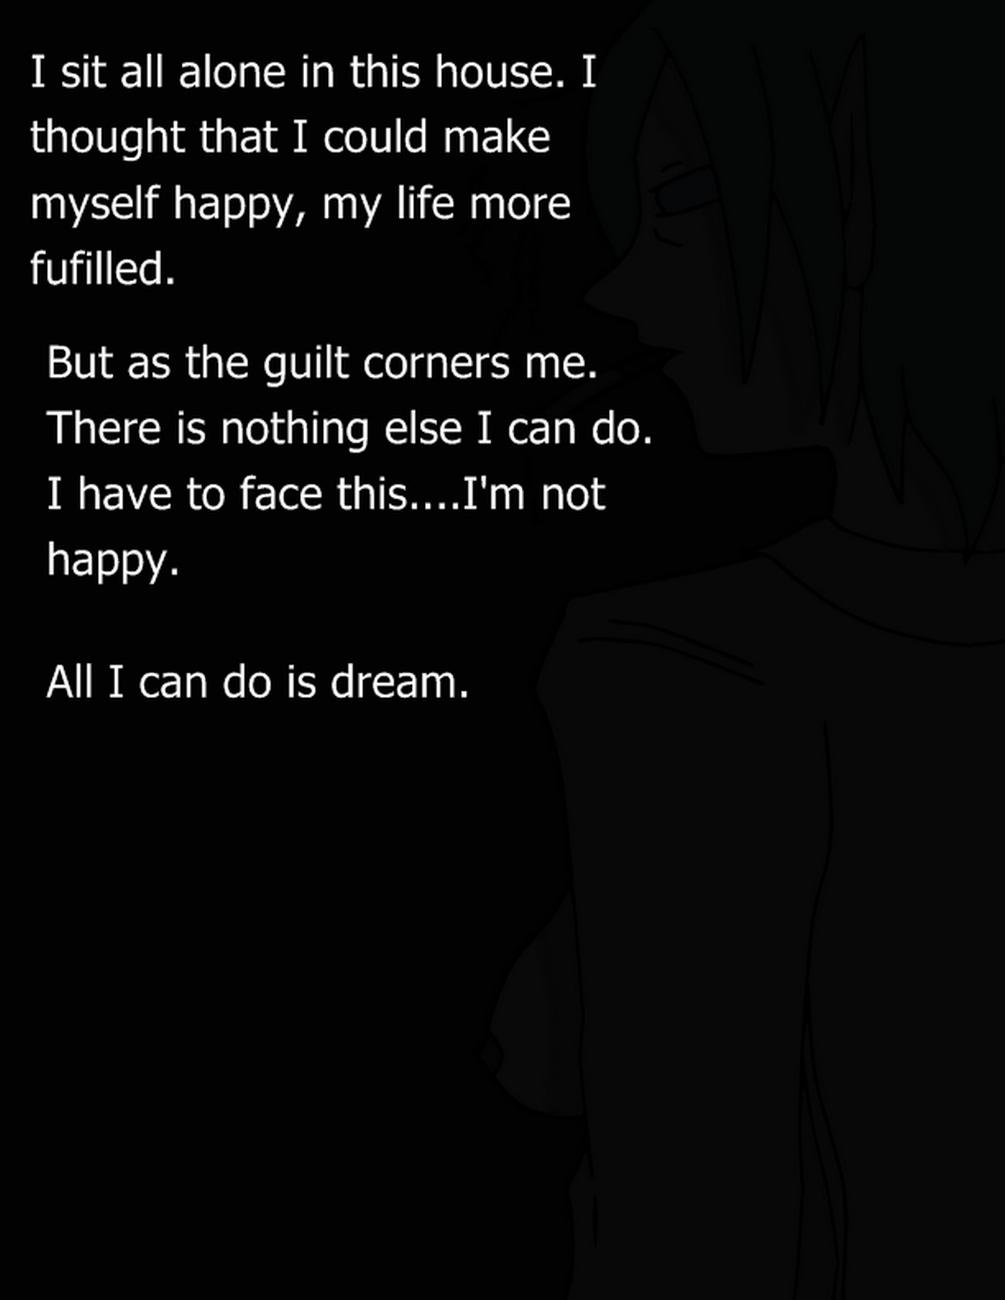 All-I-Do-Is-Dream 2 free sex comic